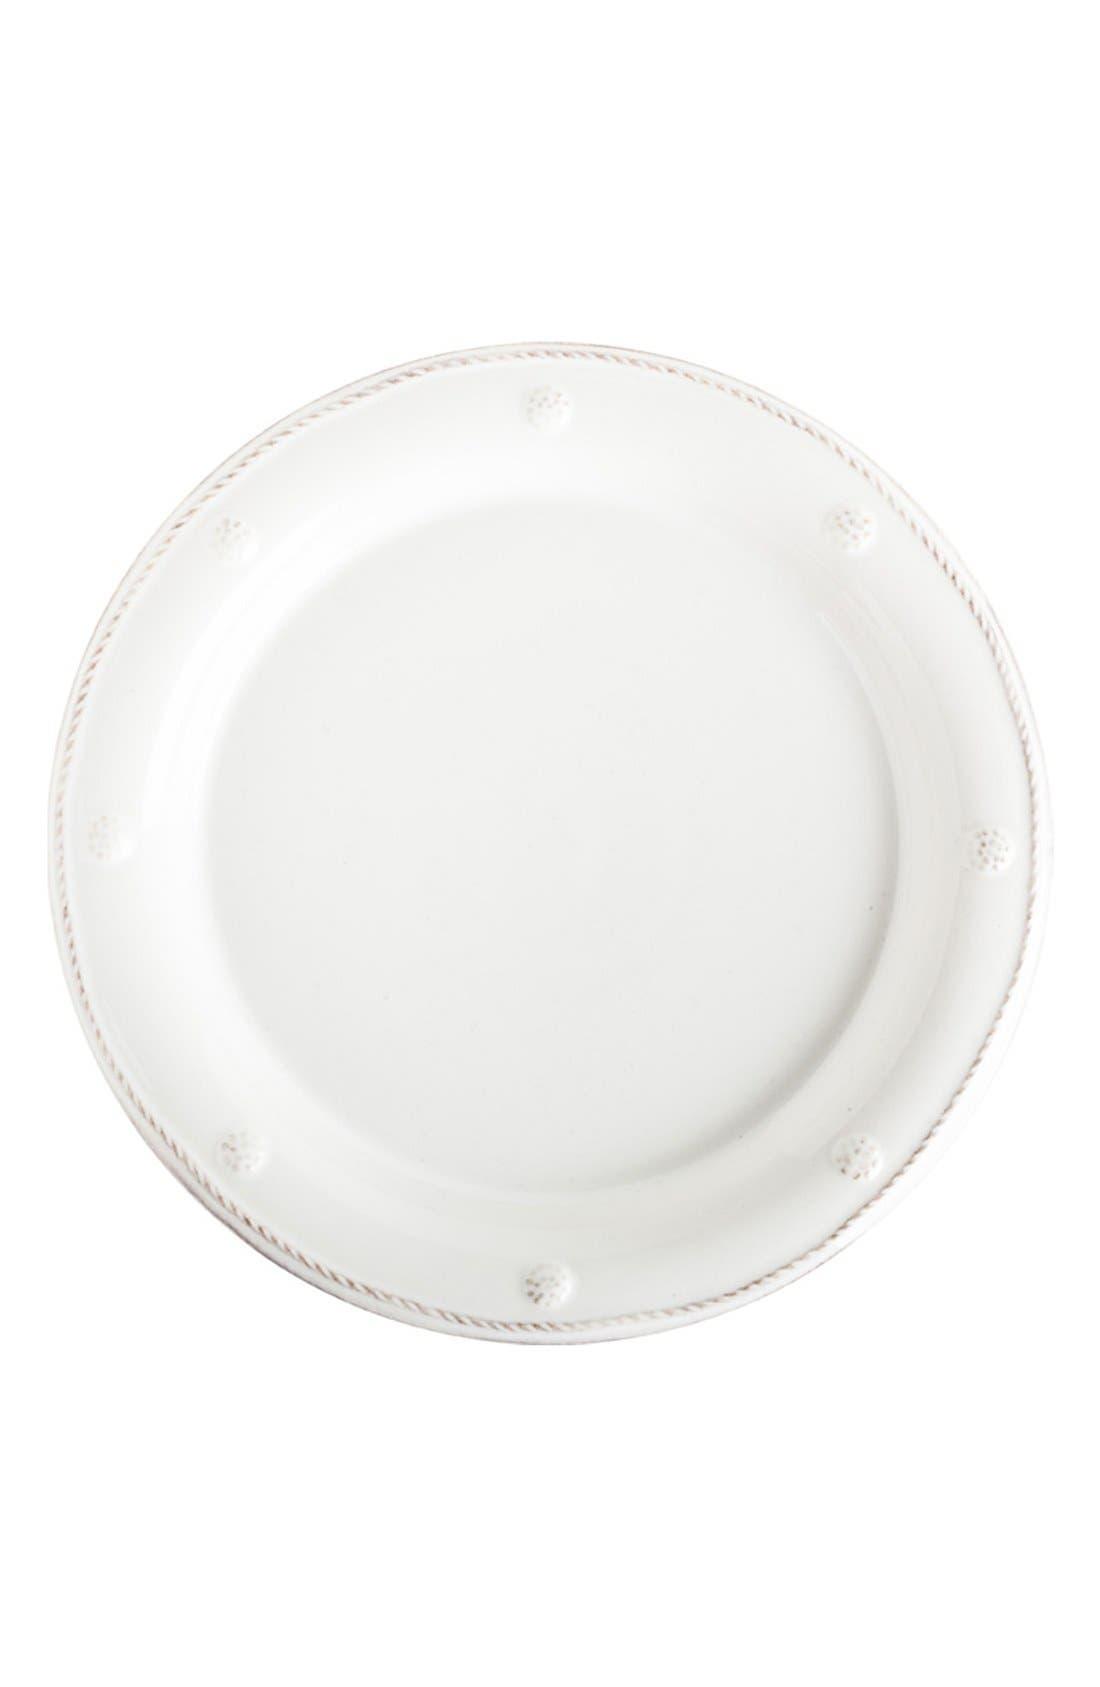 Main Image - Juliska 'Berry and Thread' Salad Plate